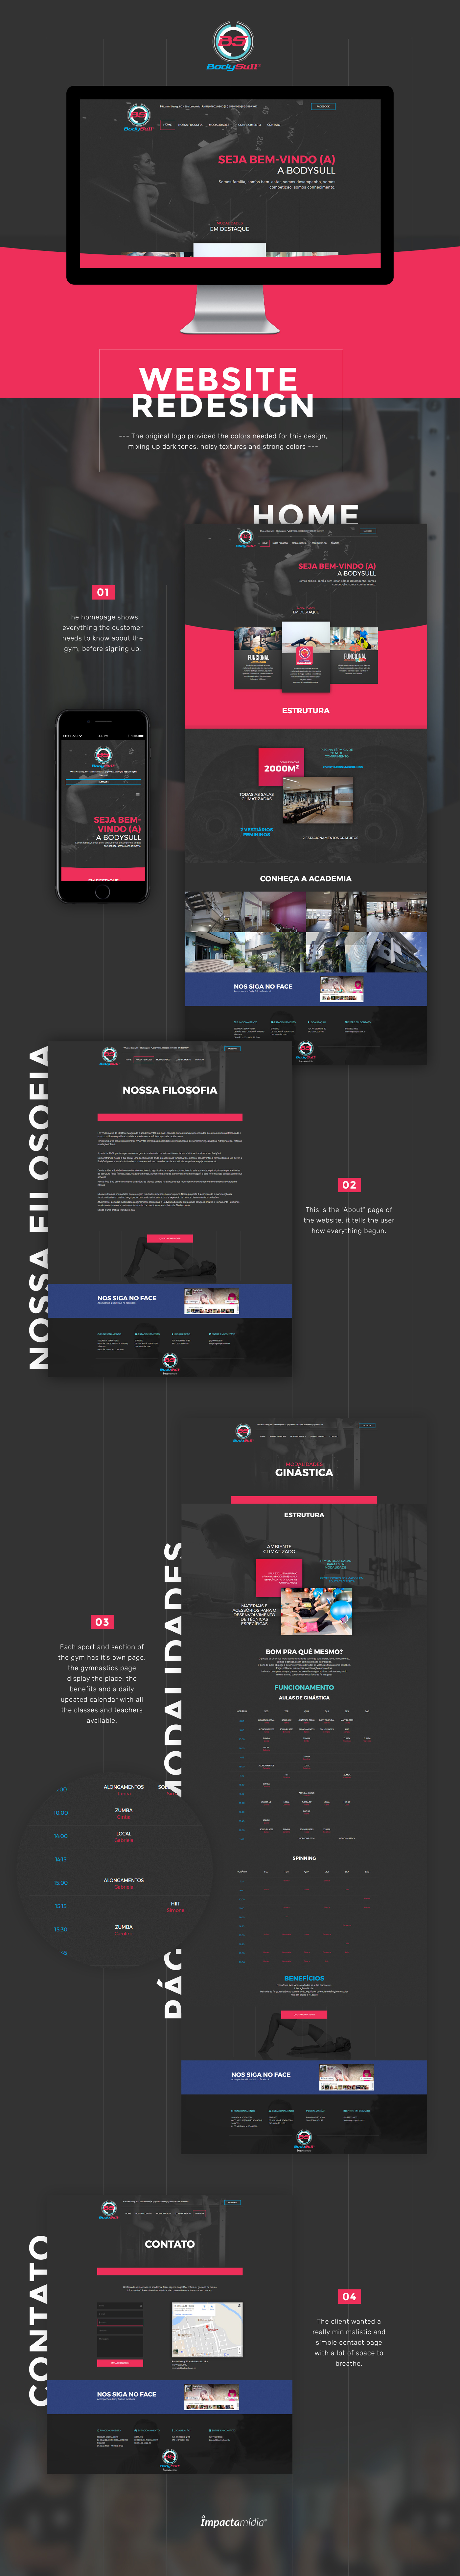 Webdesign magenta cyan blue dark Web web design dar strong colors Web Design  redesign